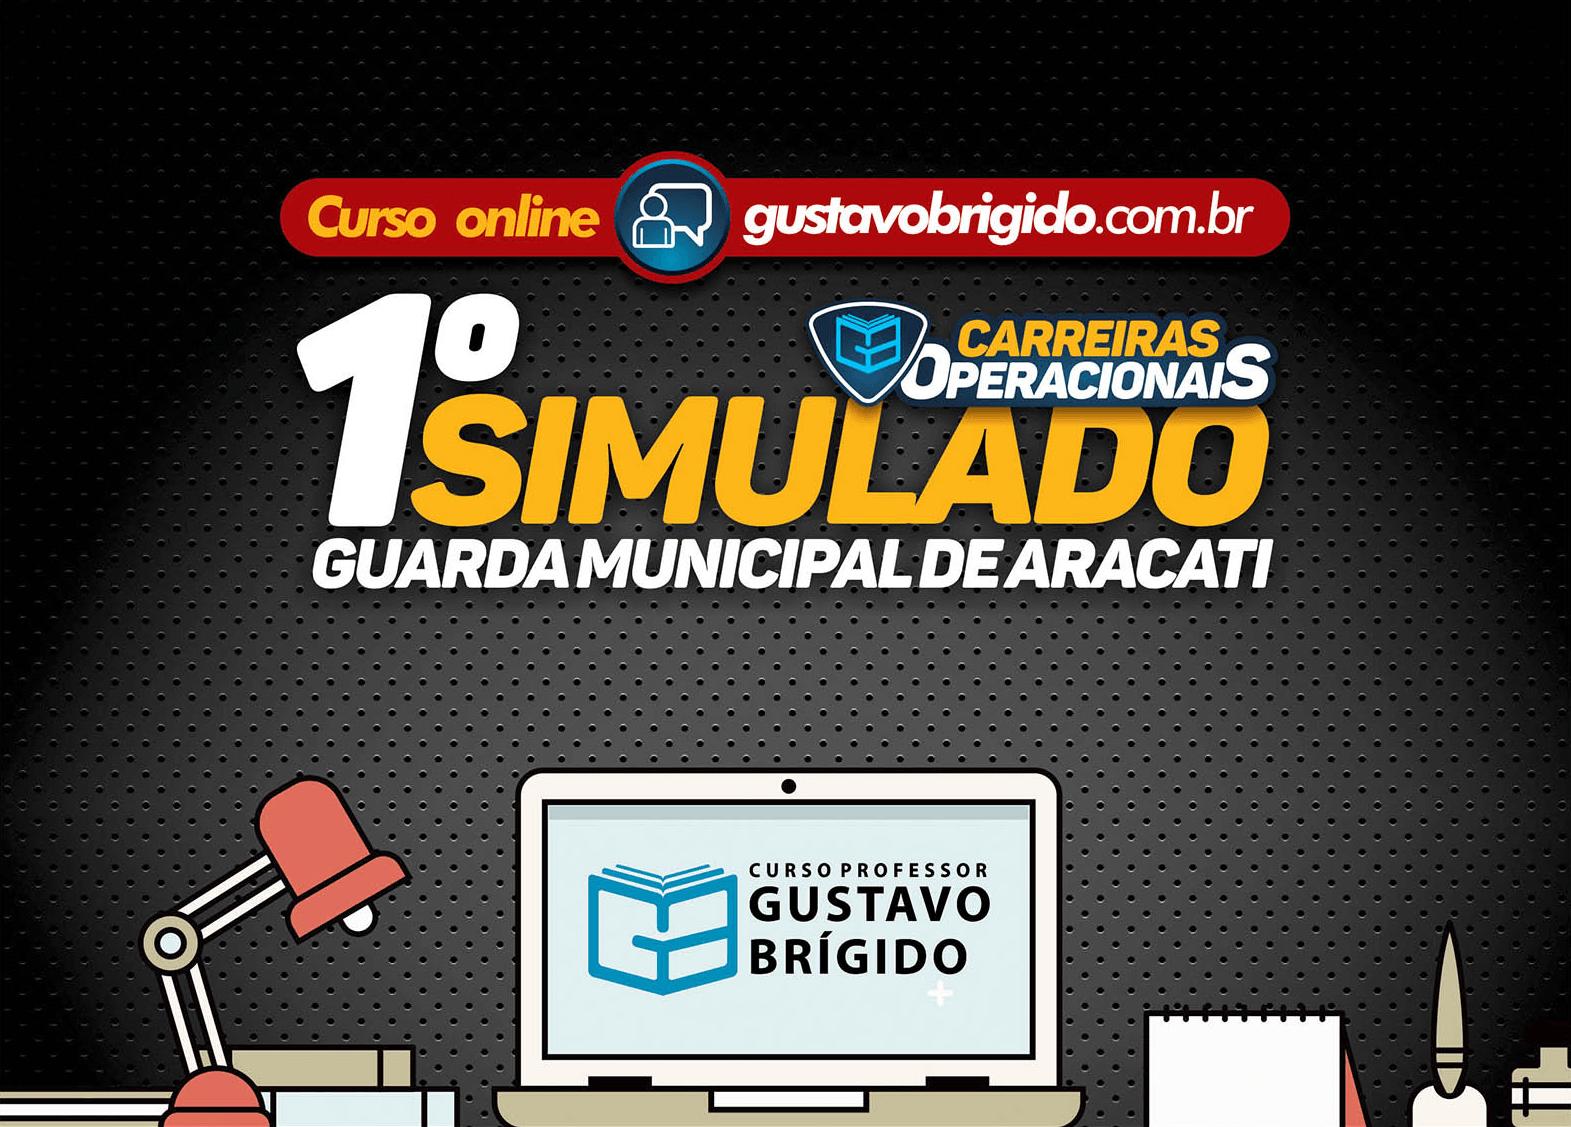 1° SIMULADO GUARDA MUNICIPAL DE ARACATI - EM PDF